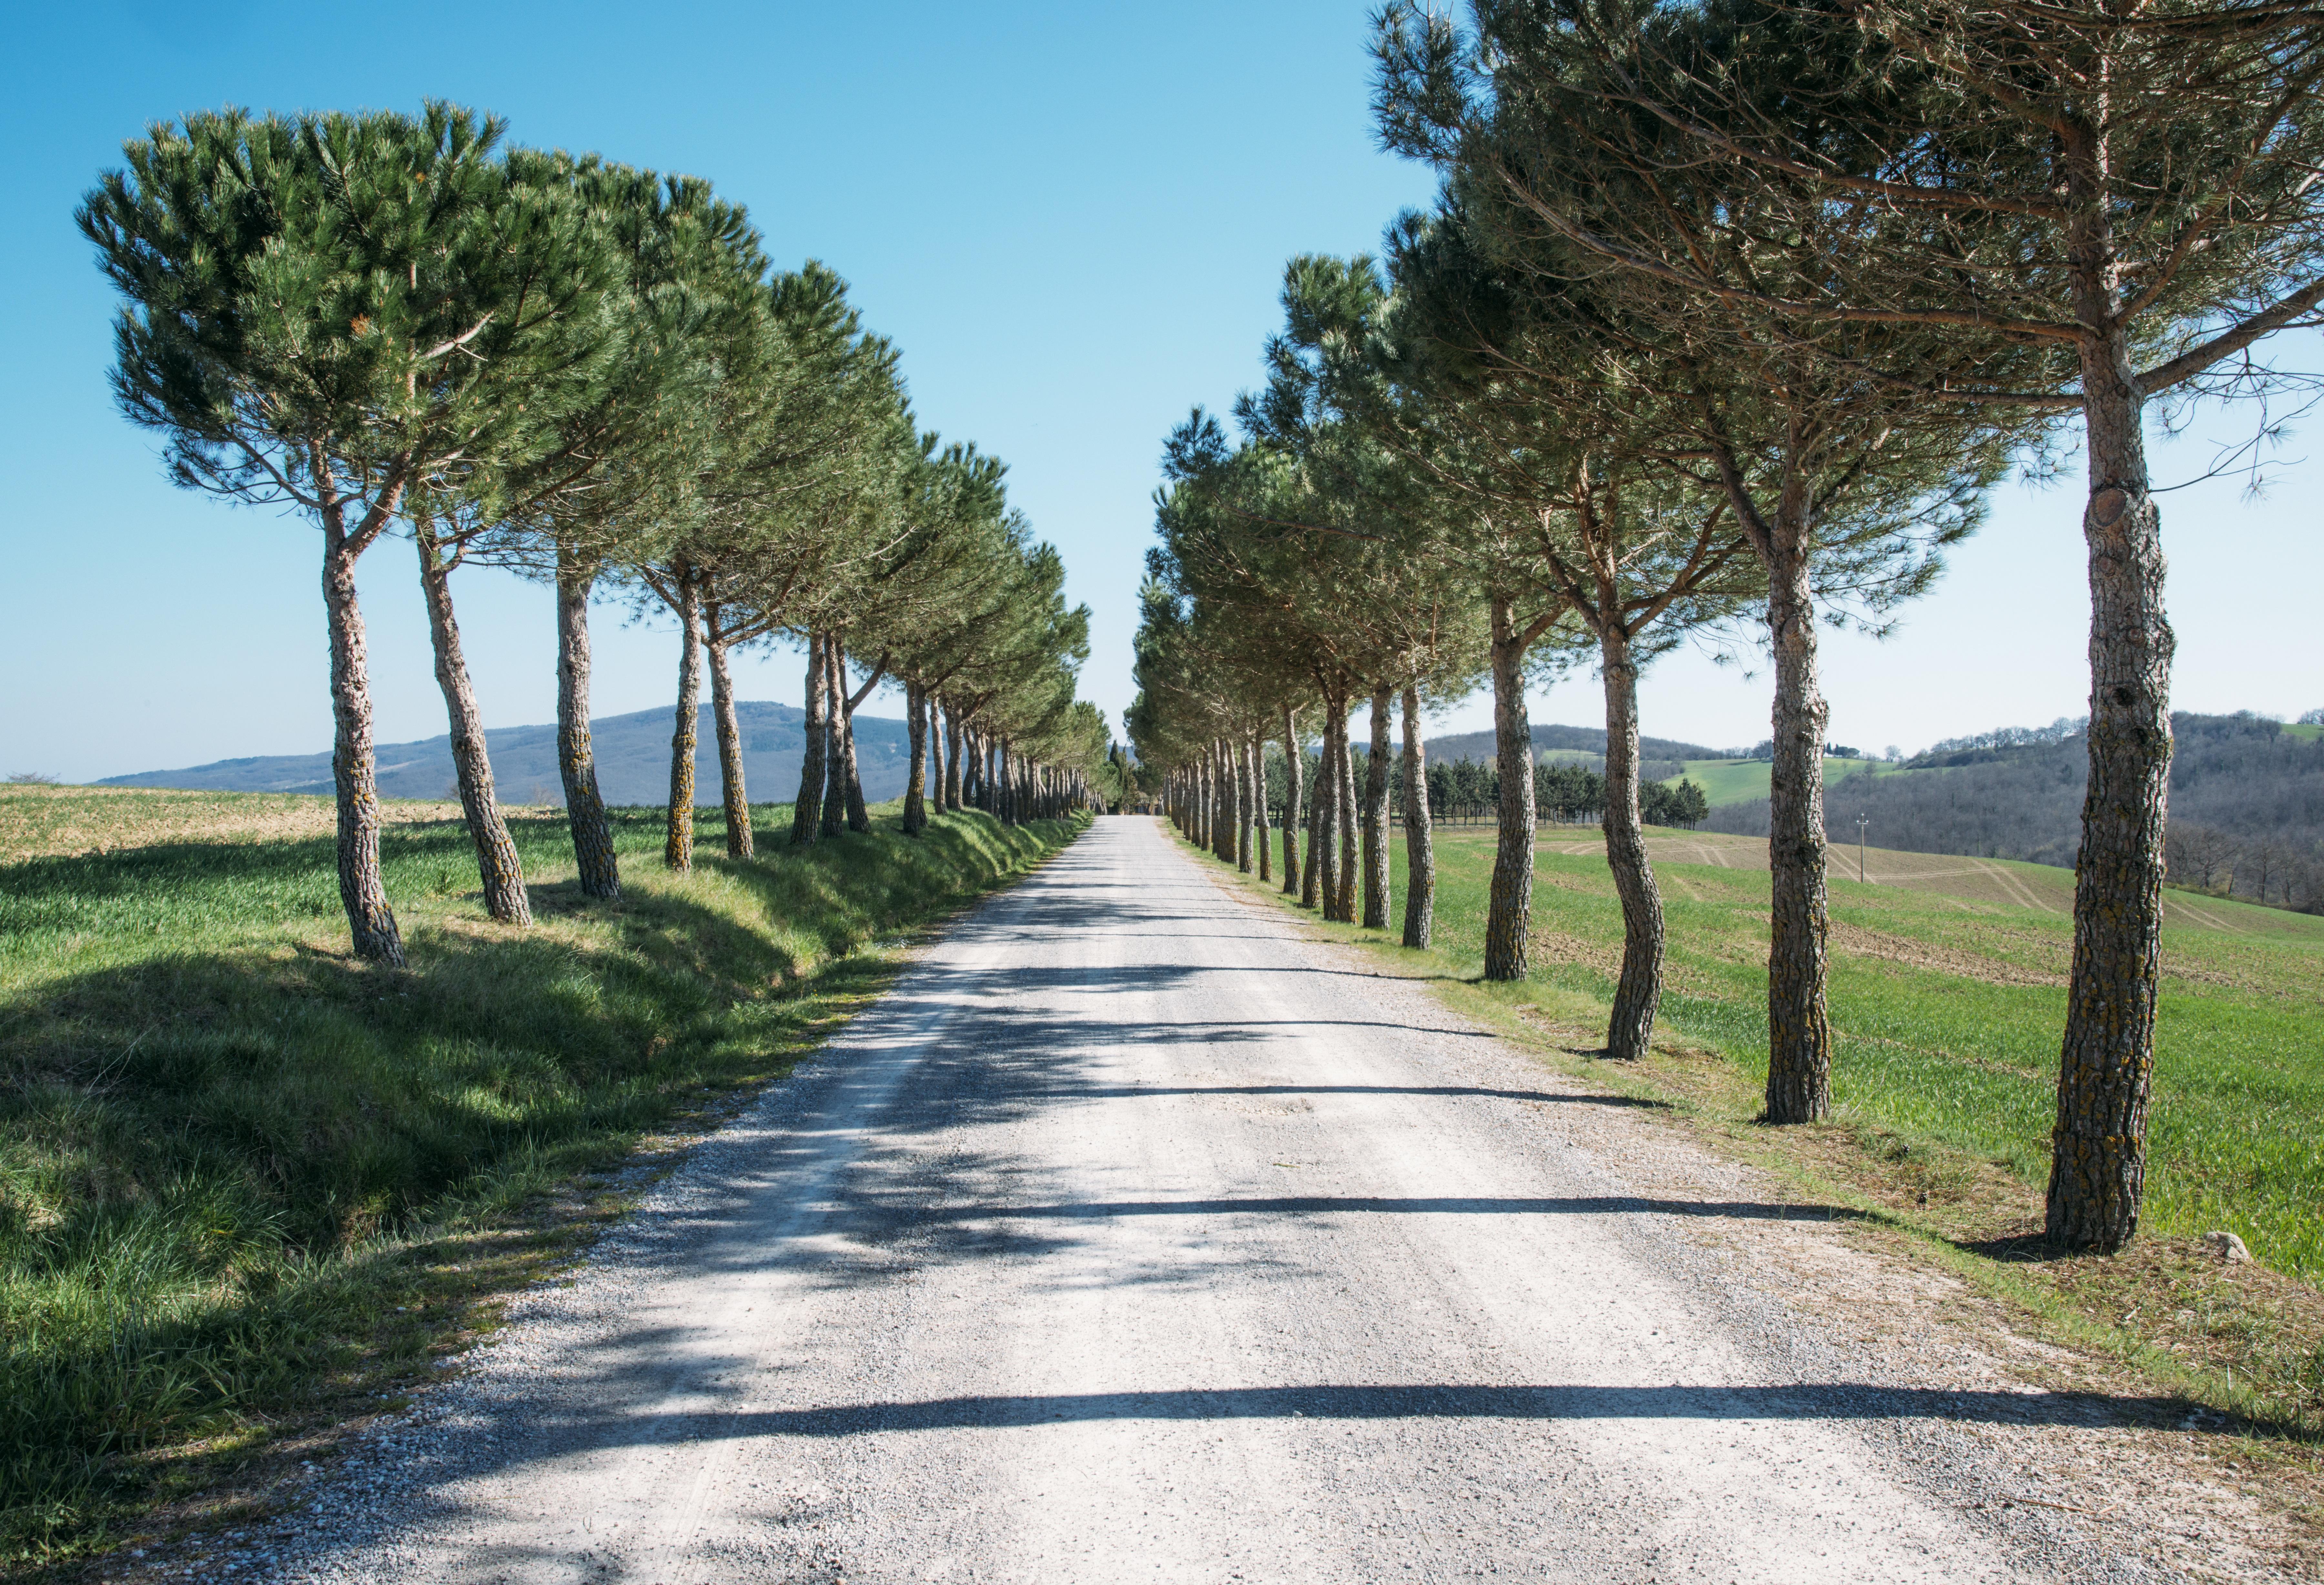 The Route, Green, Landscape, Nature, Path, HQ Photo